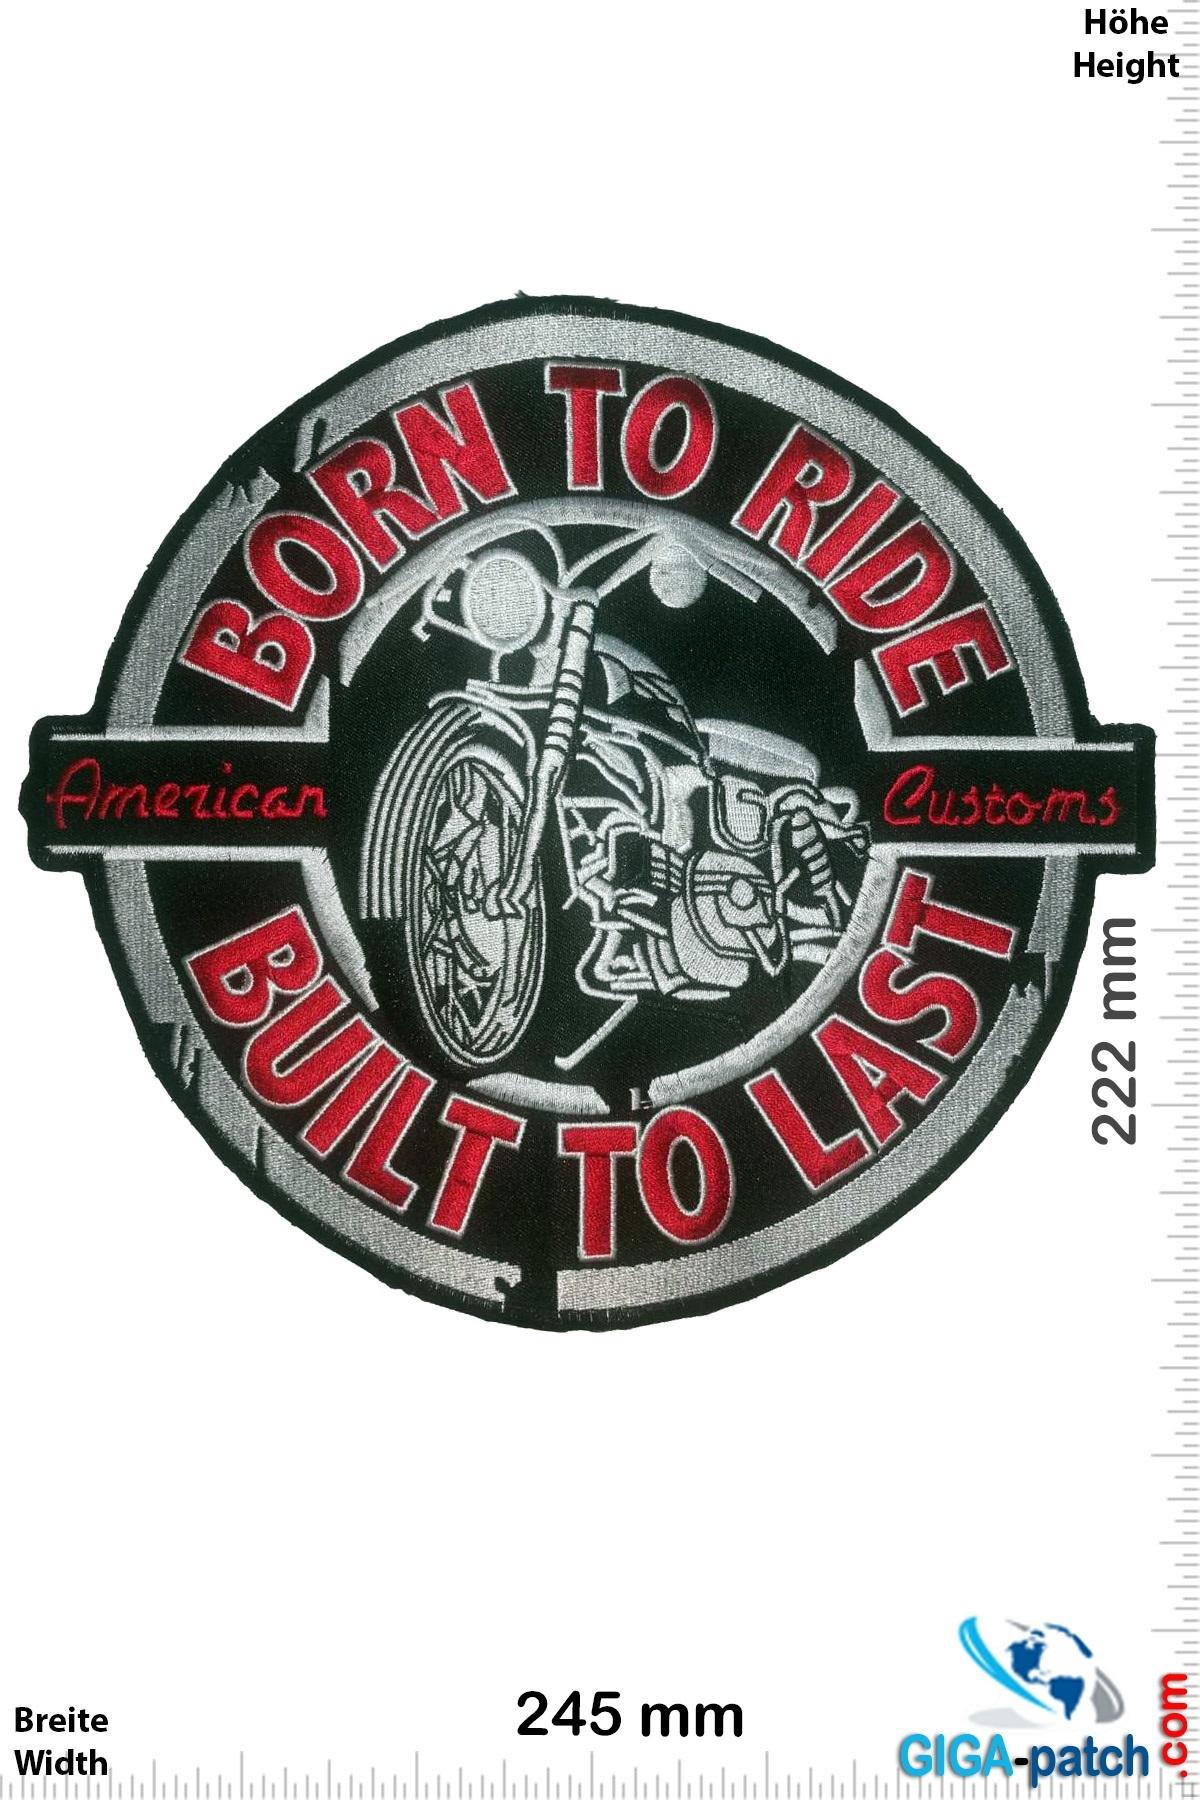 Born to Ride - Built to Last - American Customs -27 cm